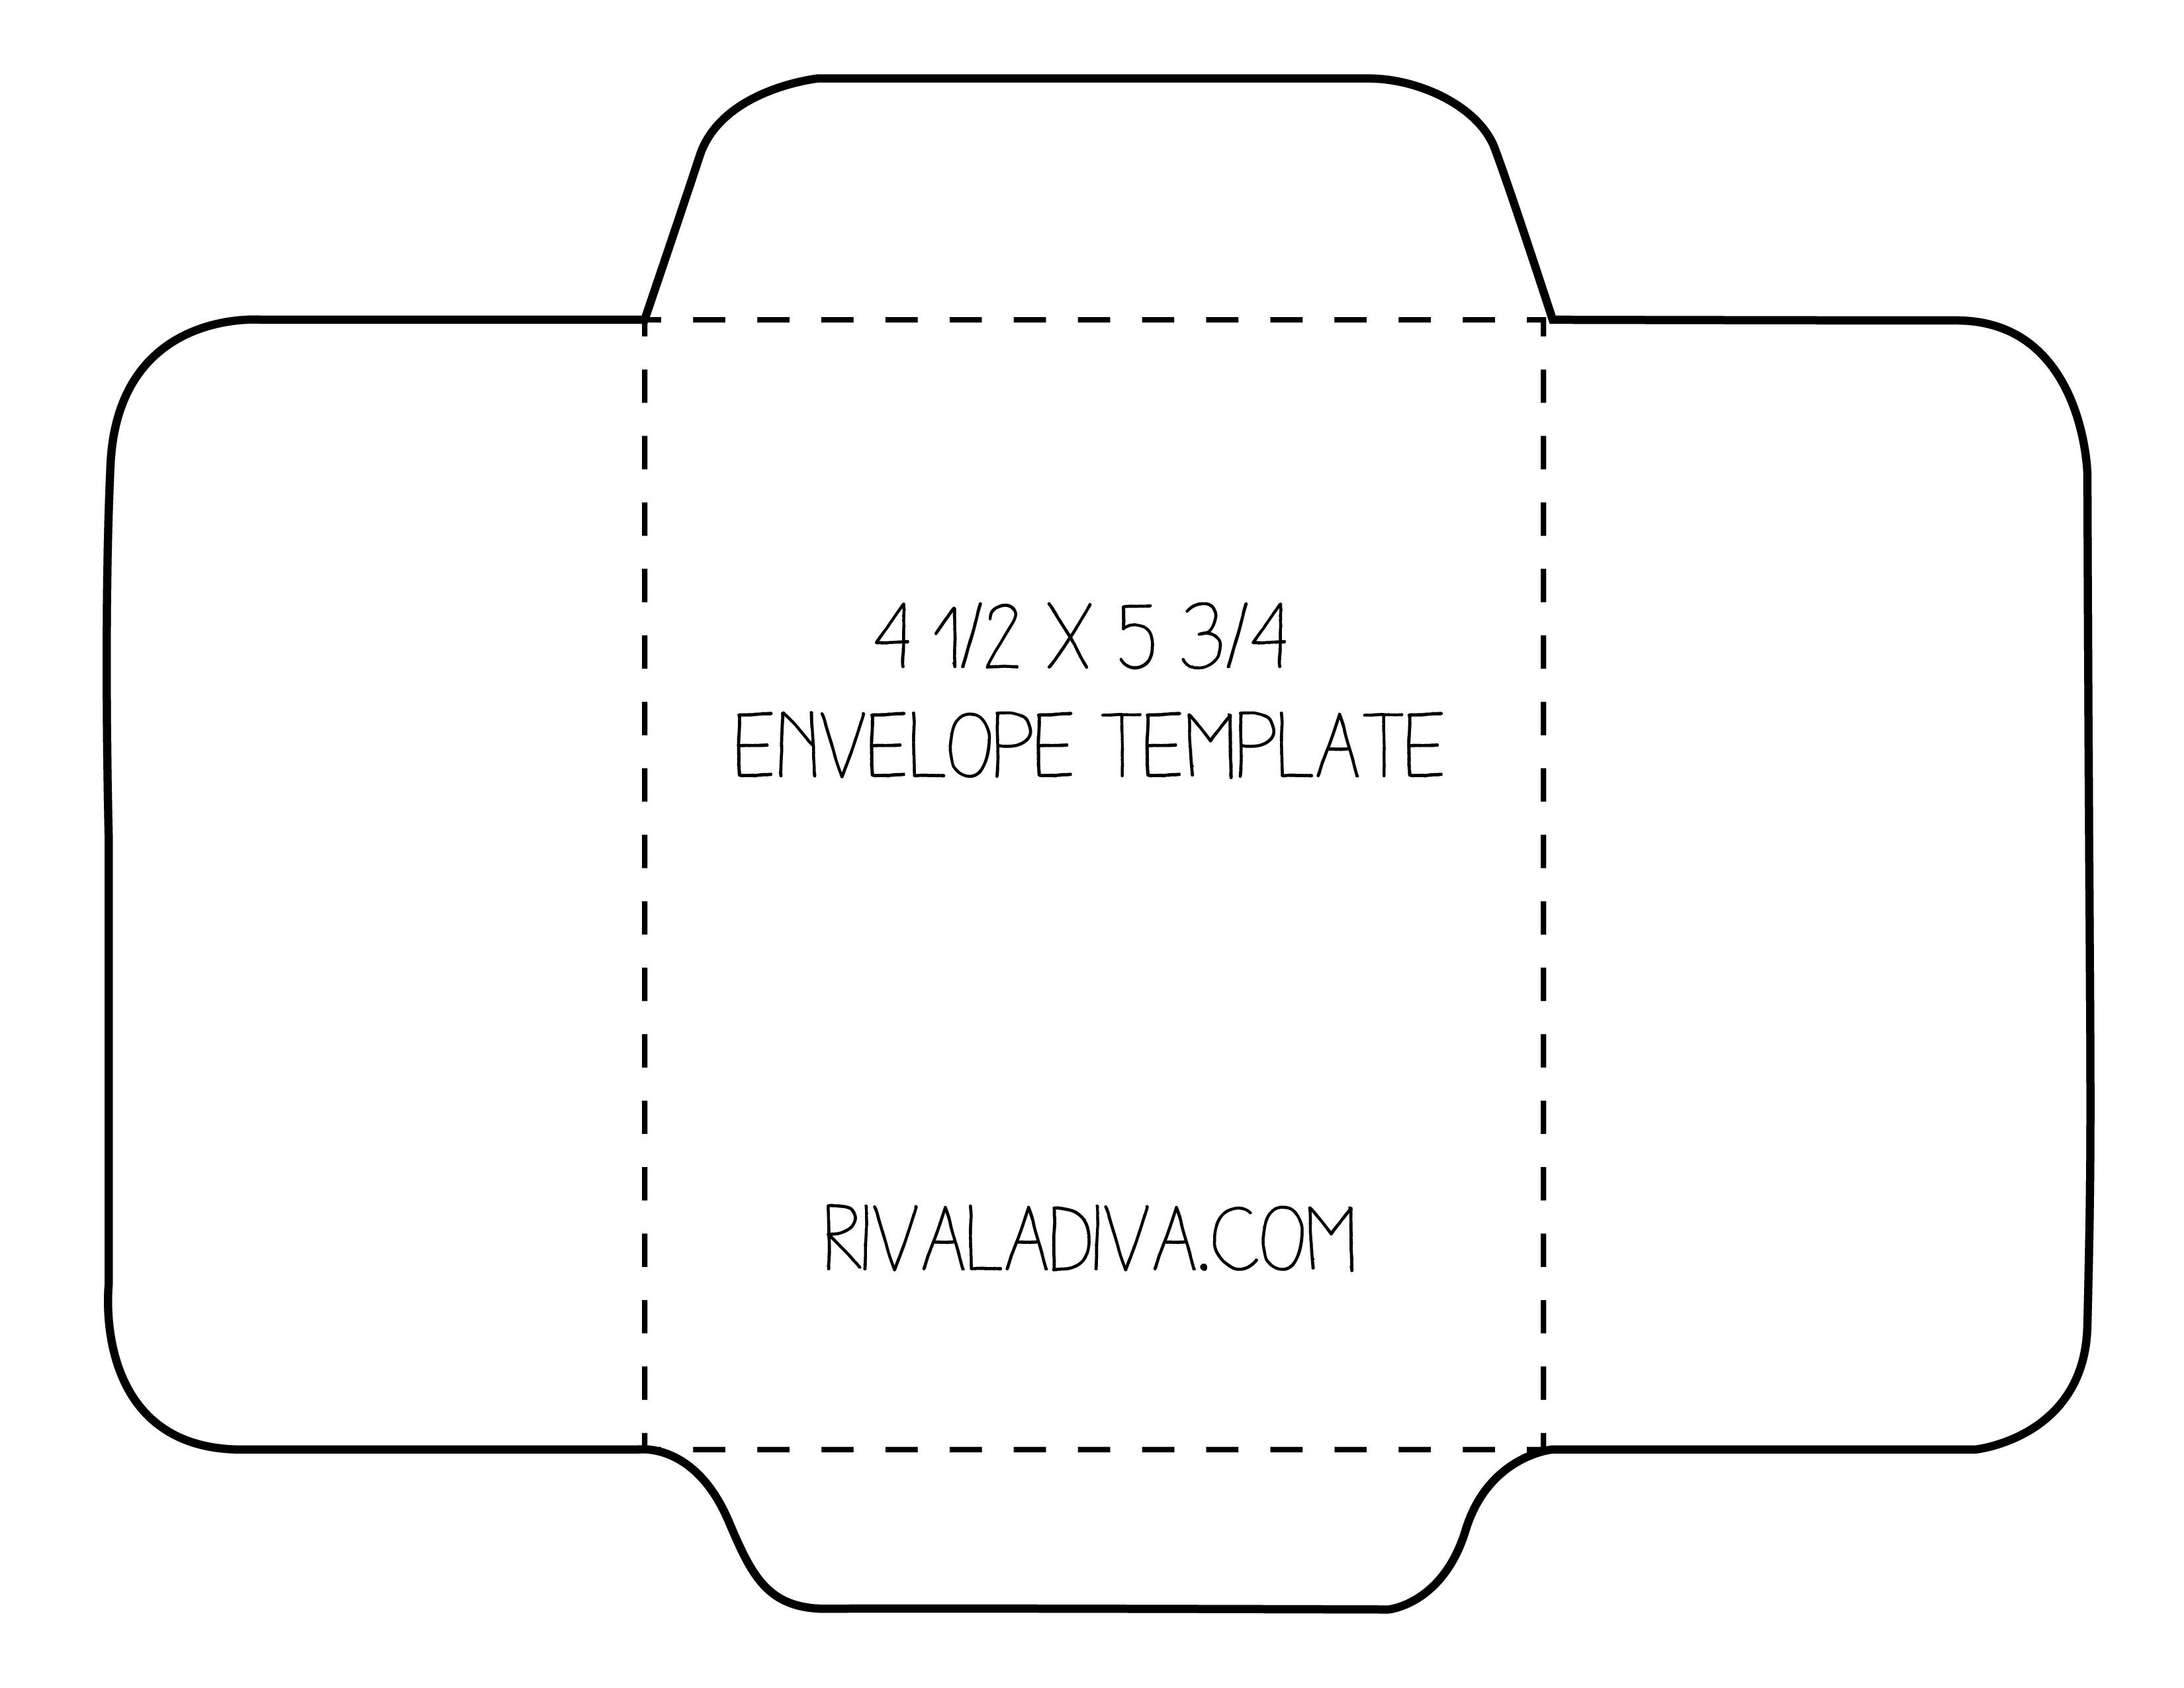 Envelope Template | Envelope Template For 8.5 X 11 Paper Diy - Free Printable Greeting Card Envelope Template